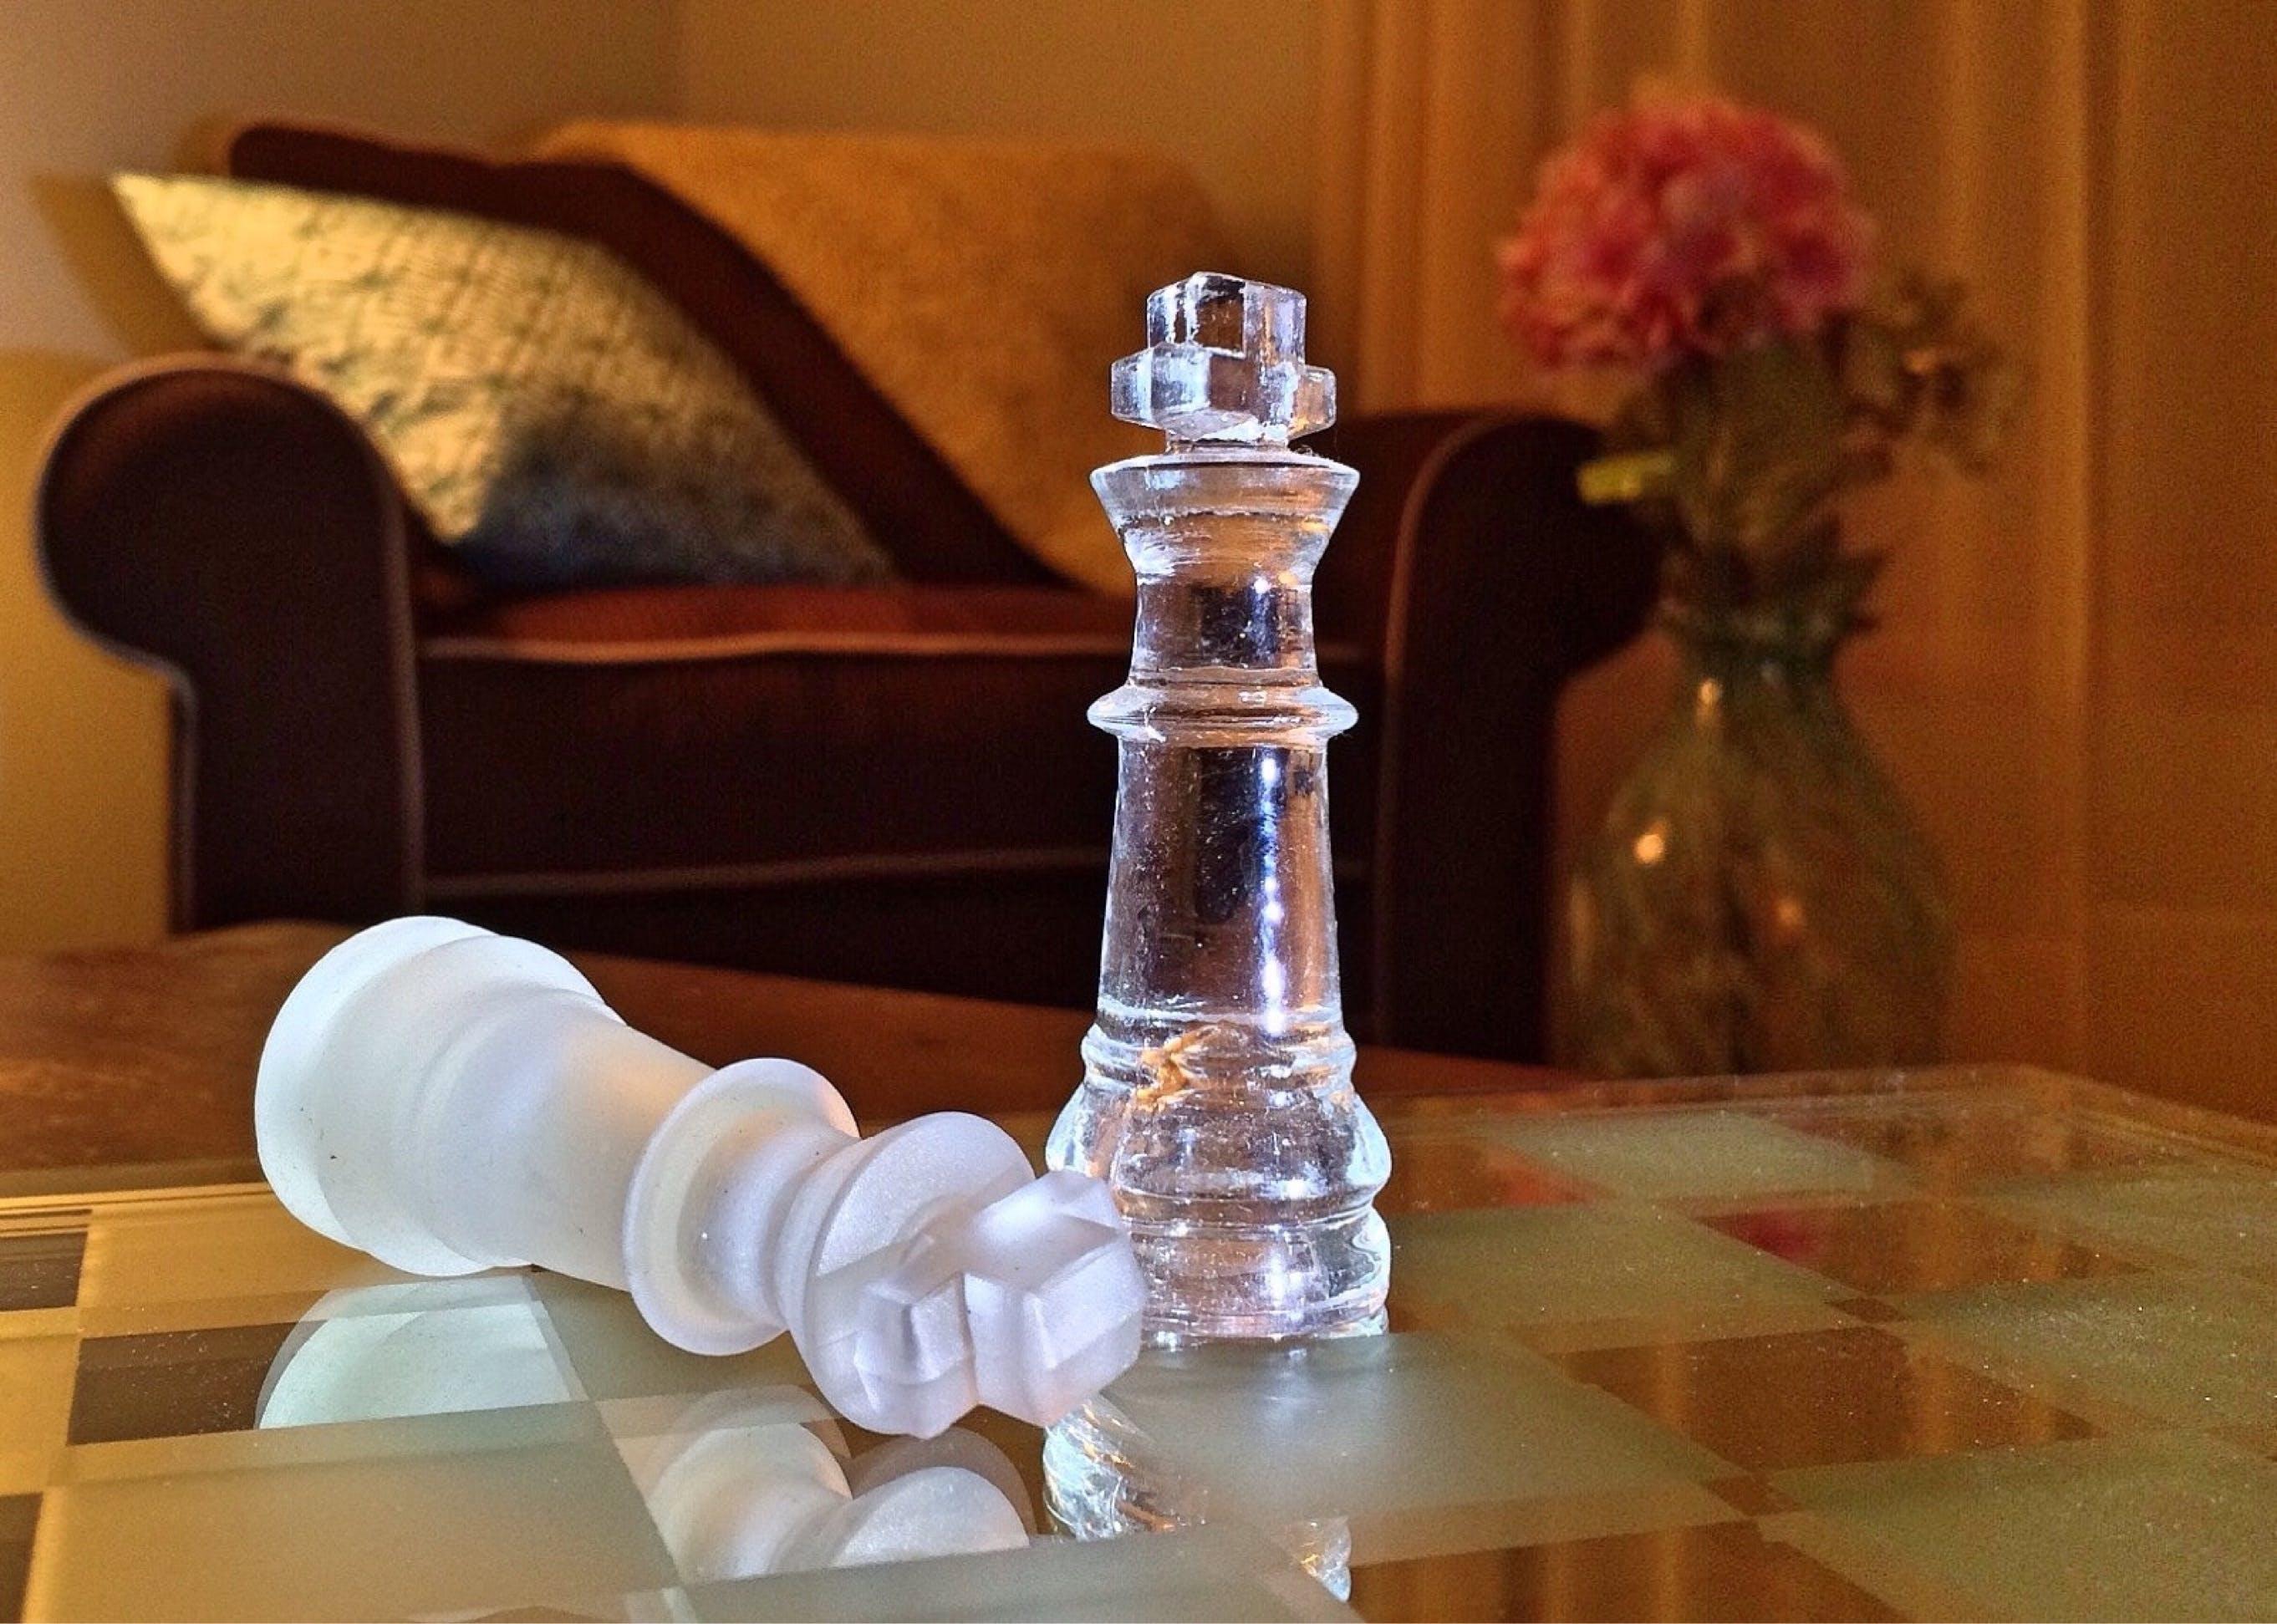 Fotos de stock gratuitas de ajedrez, batalla, claro, cristal